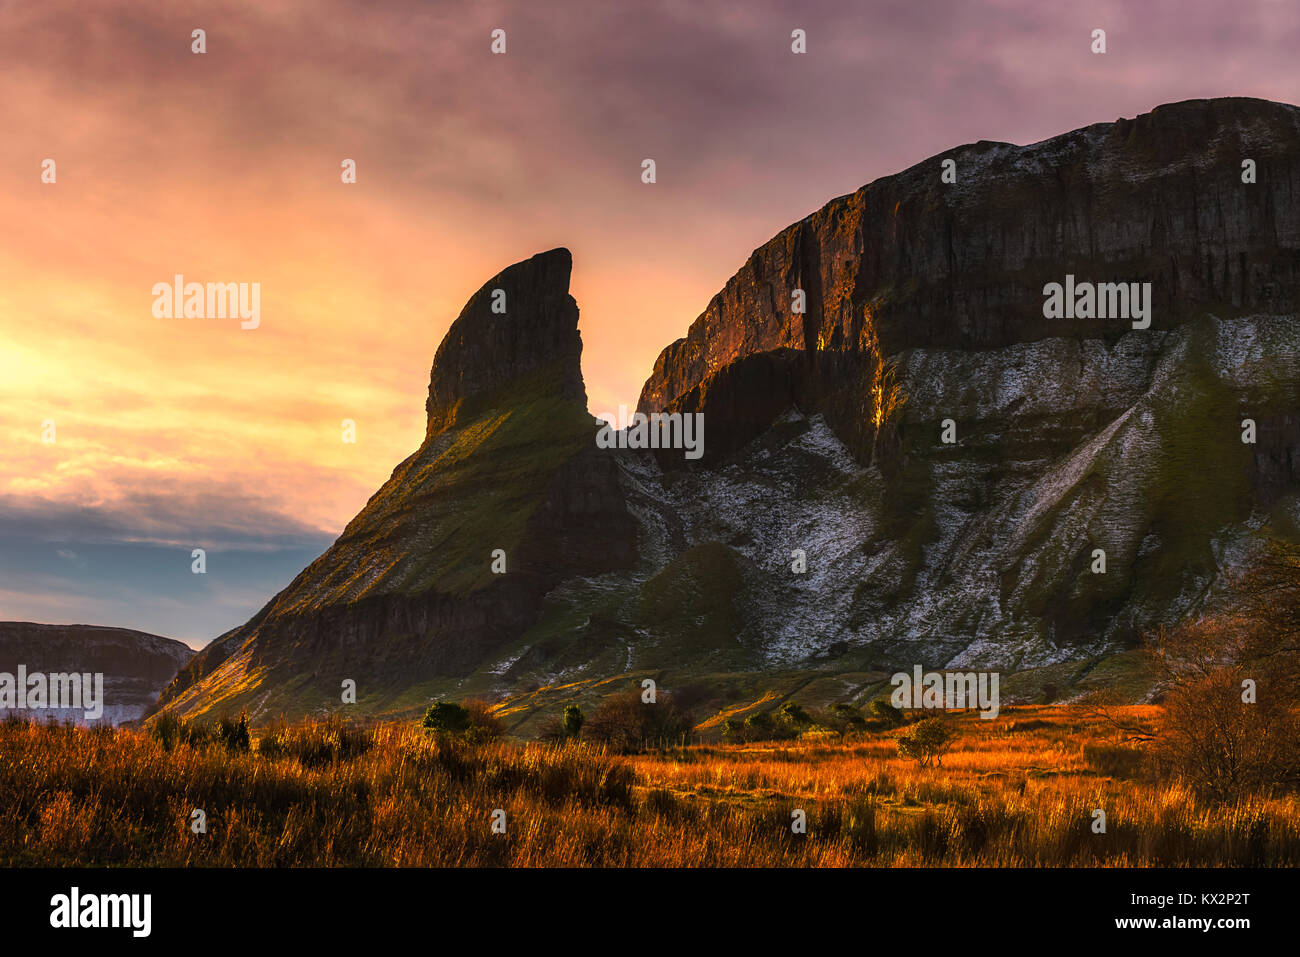 Eagle's Rock in County Leitrim - Ireland - Stock Image